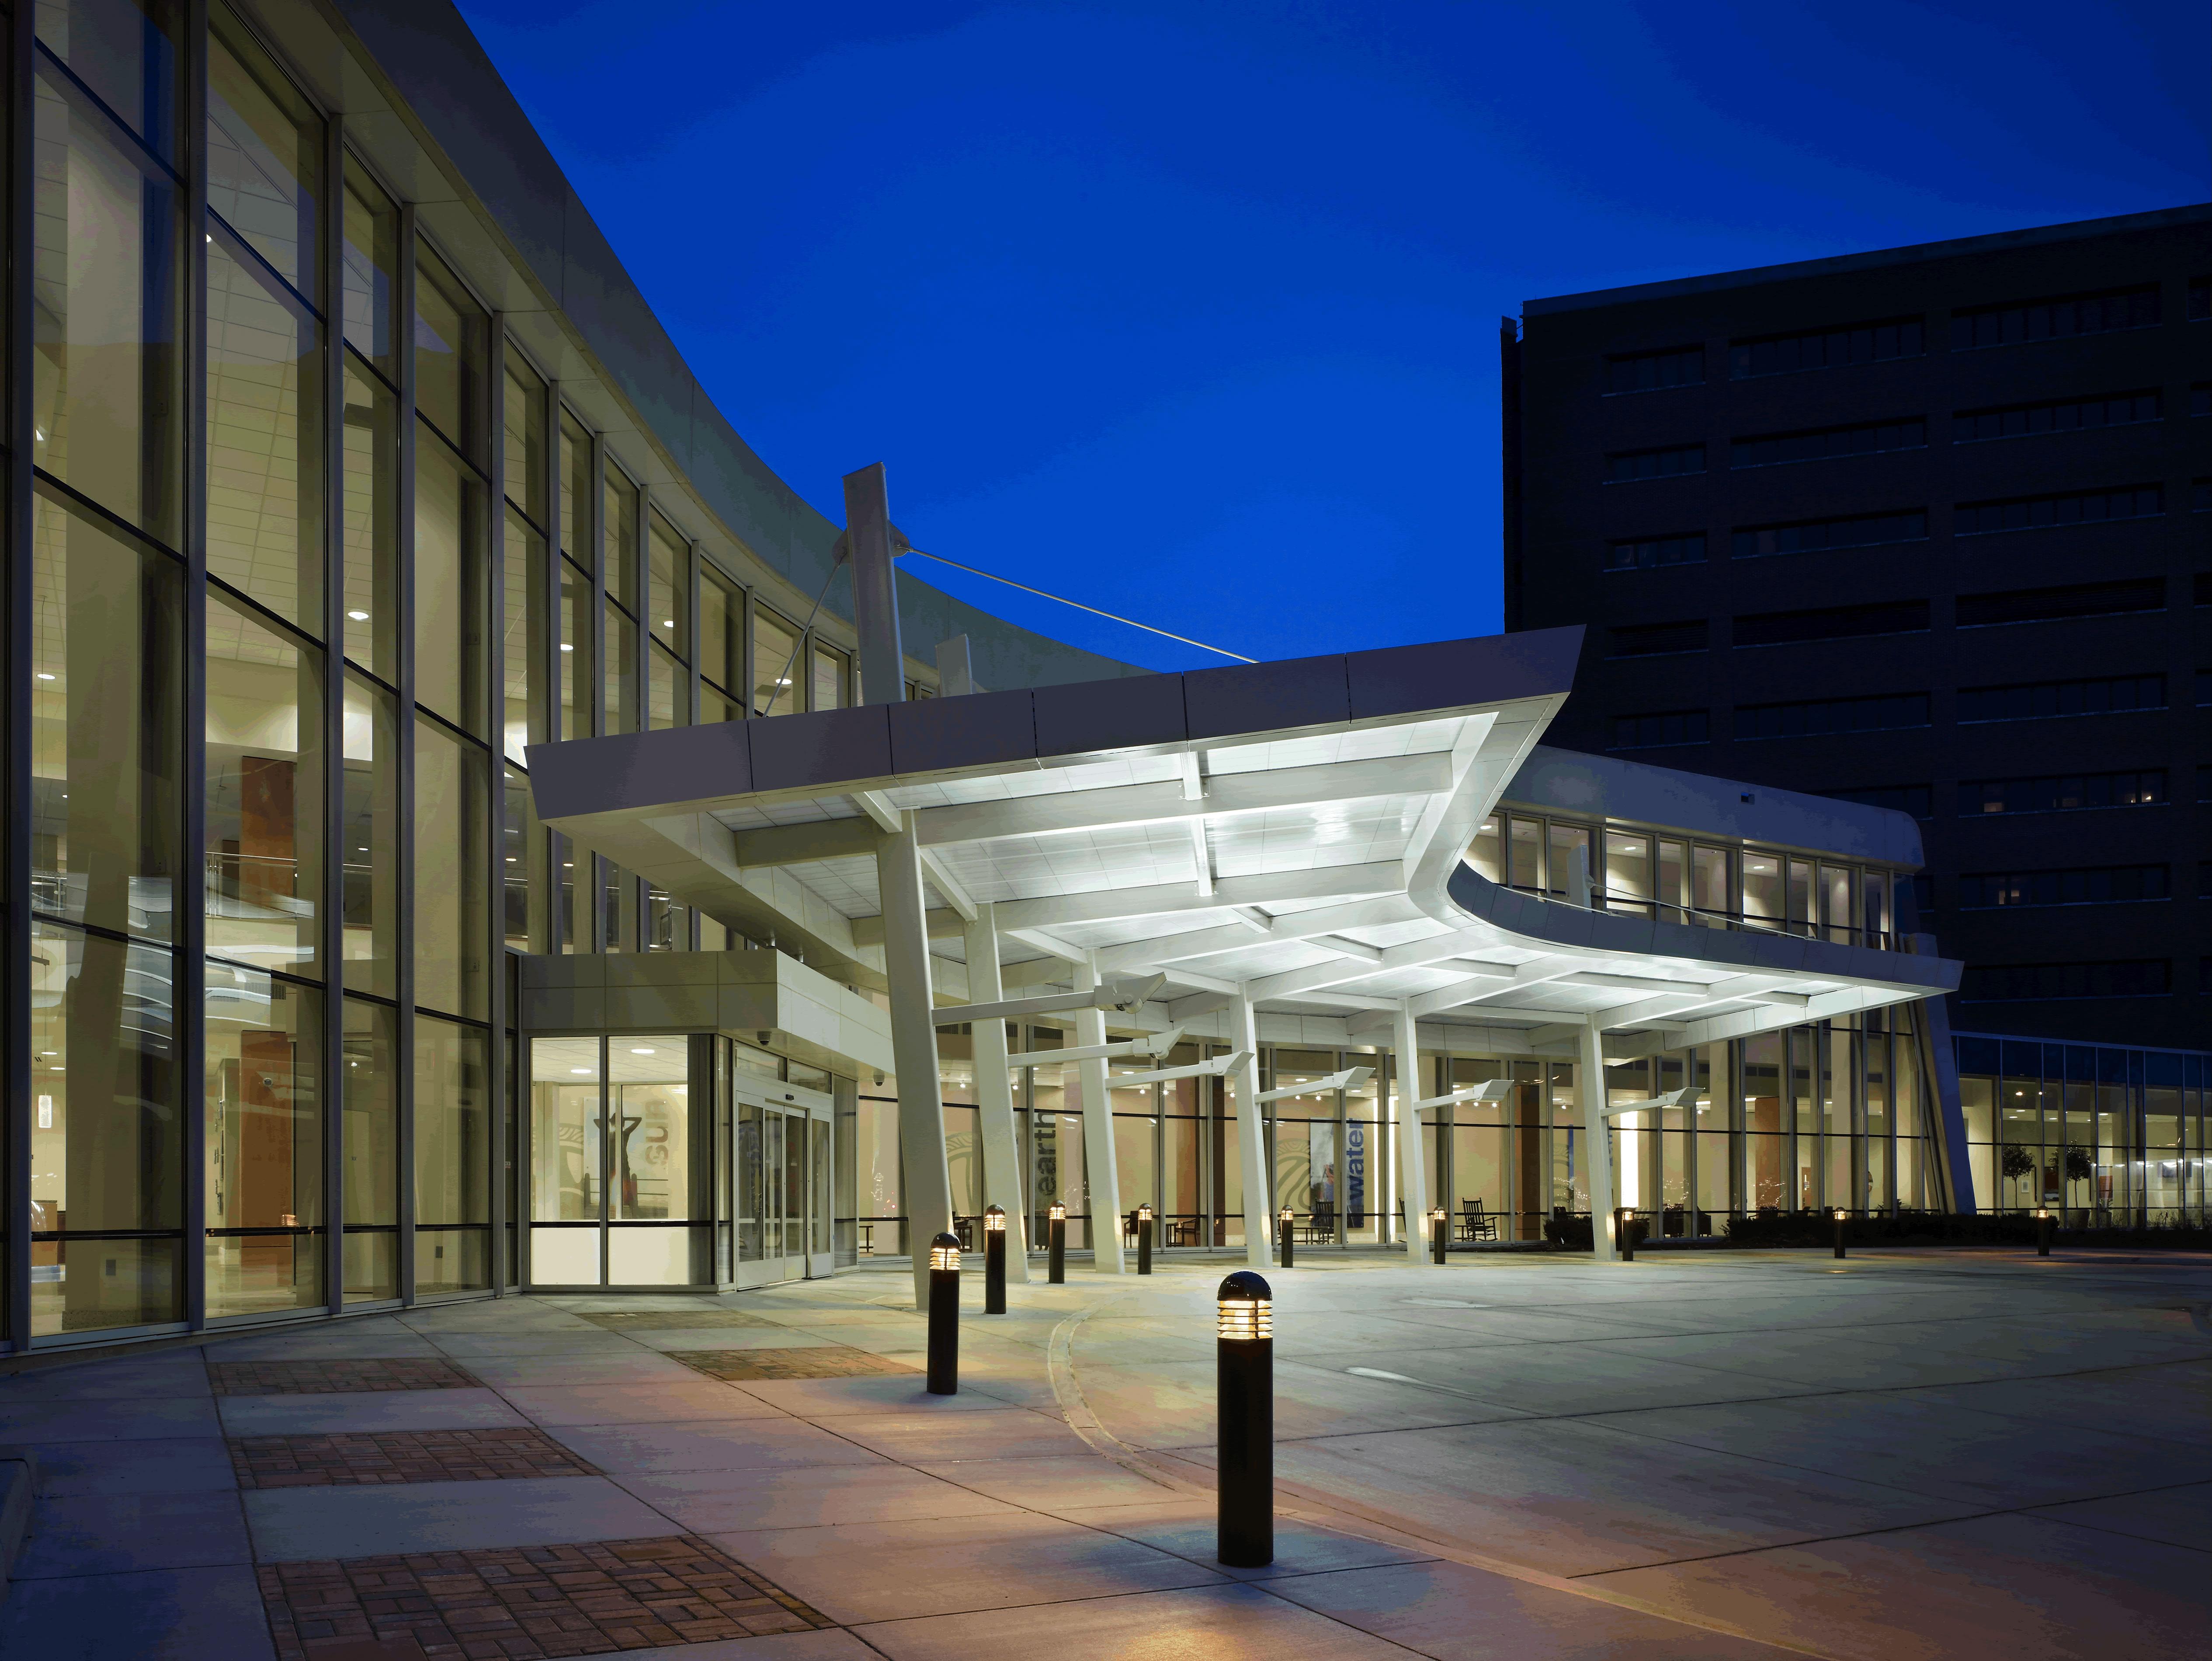 The Toledo Hospital photo